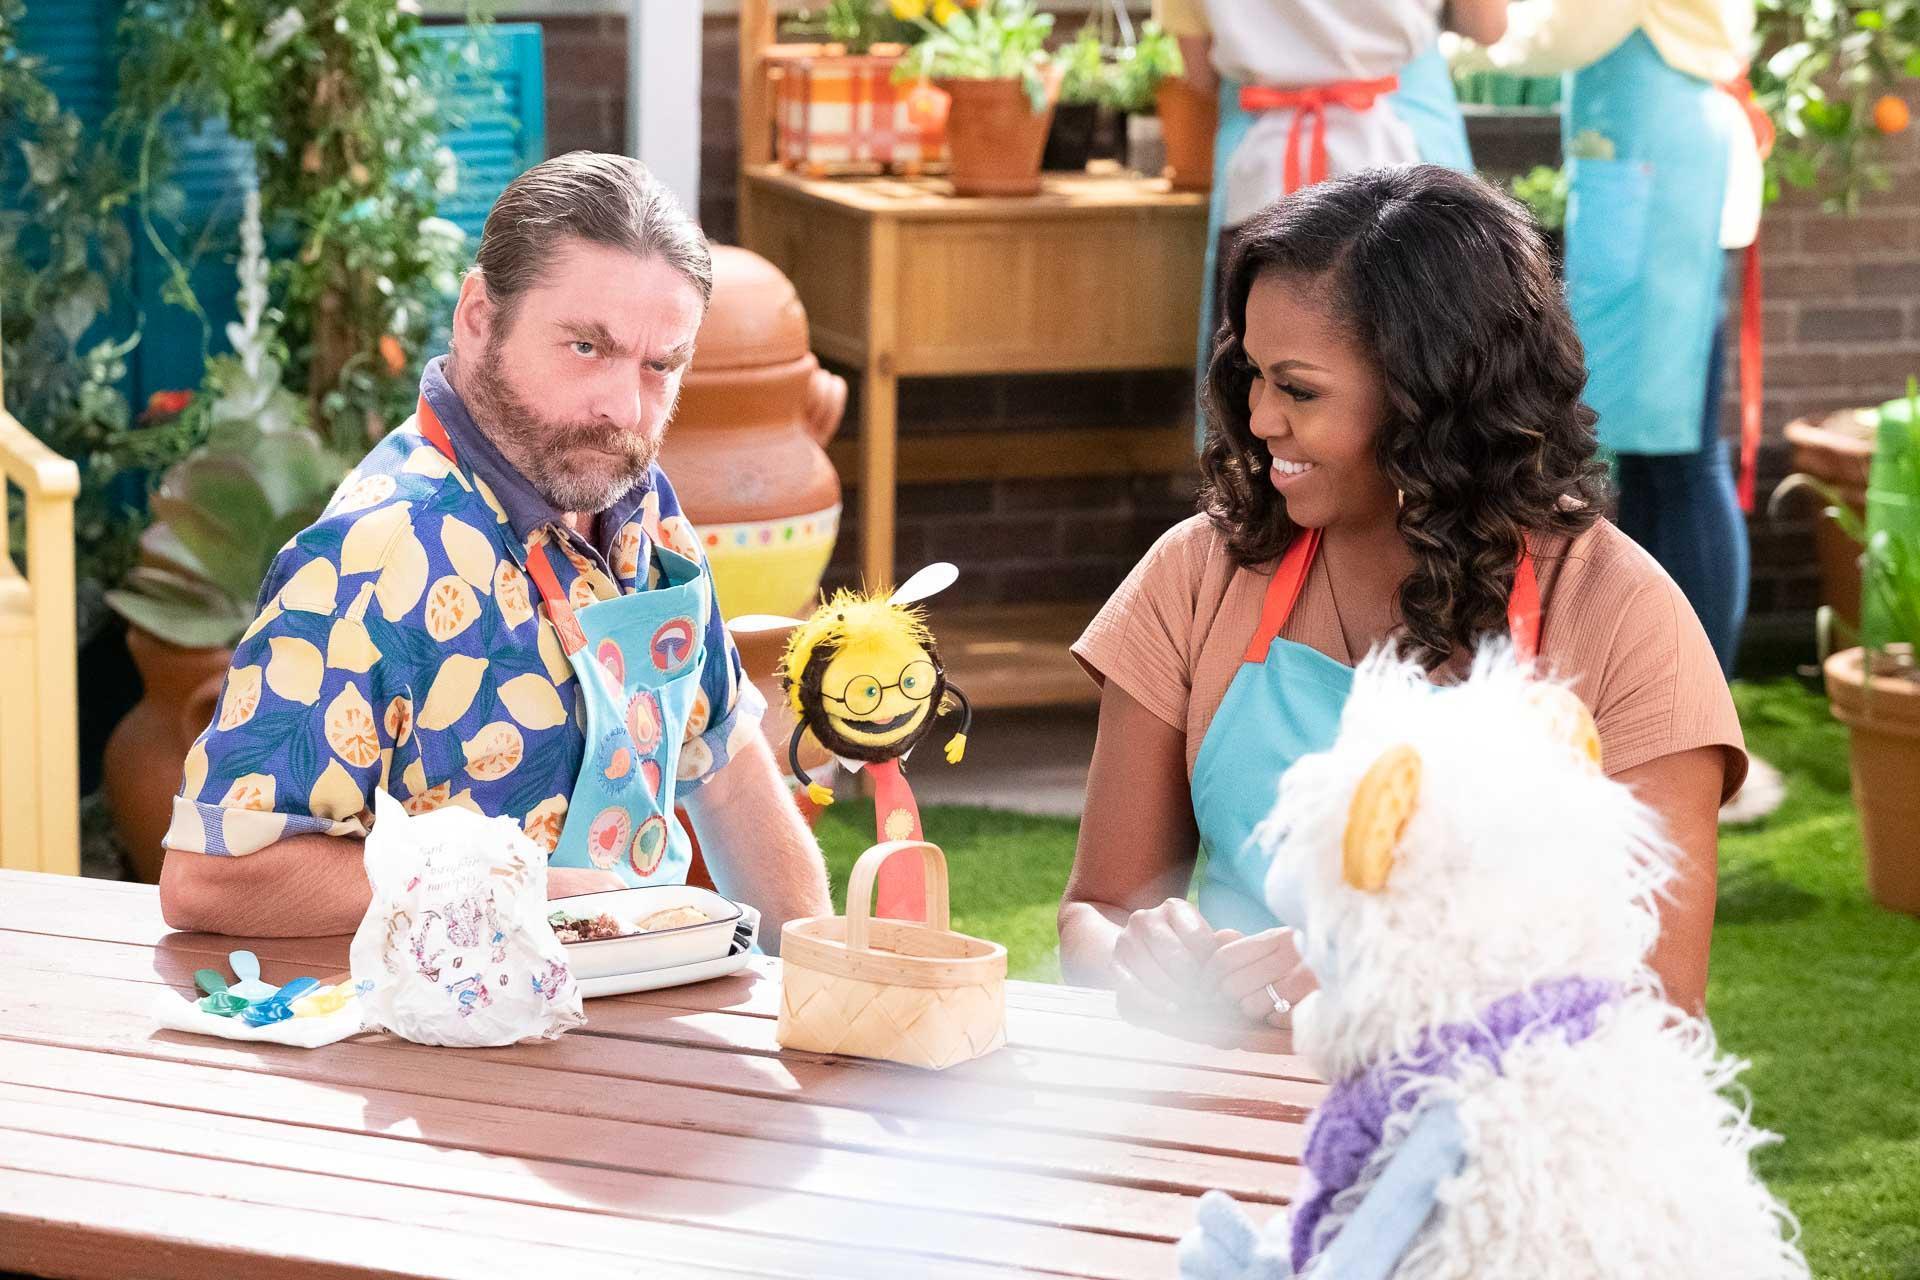 Waffles + Mochi con Michelle Obama | Zach Galifianakis